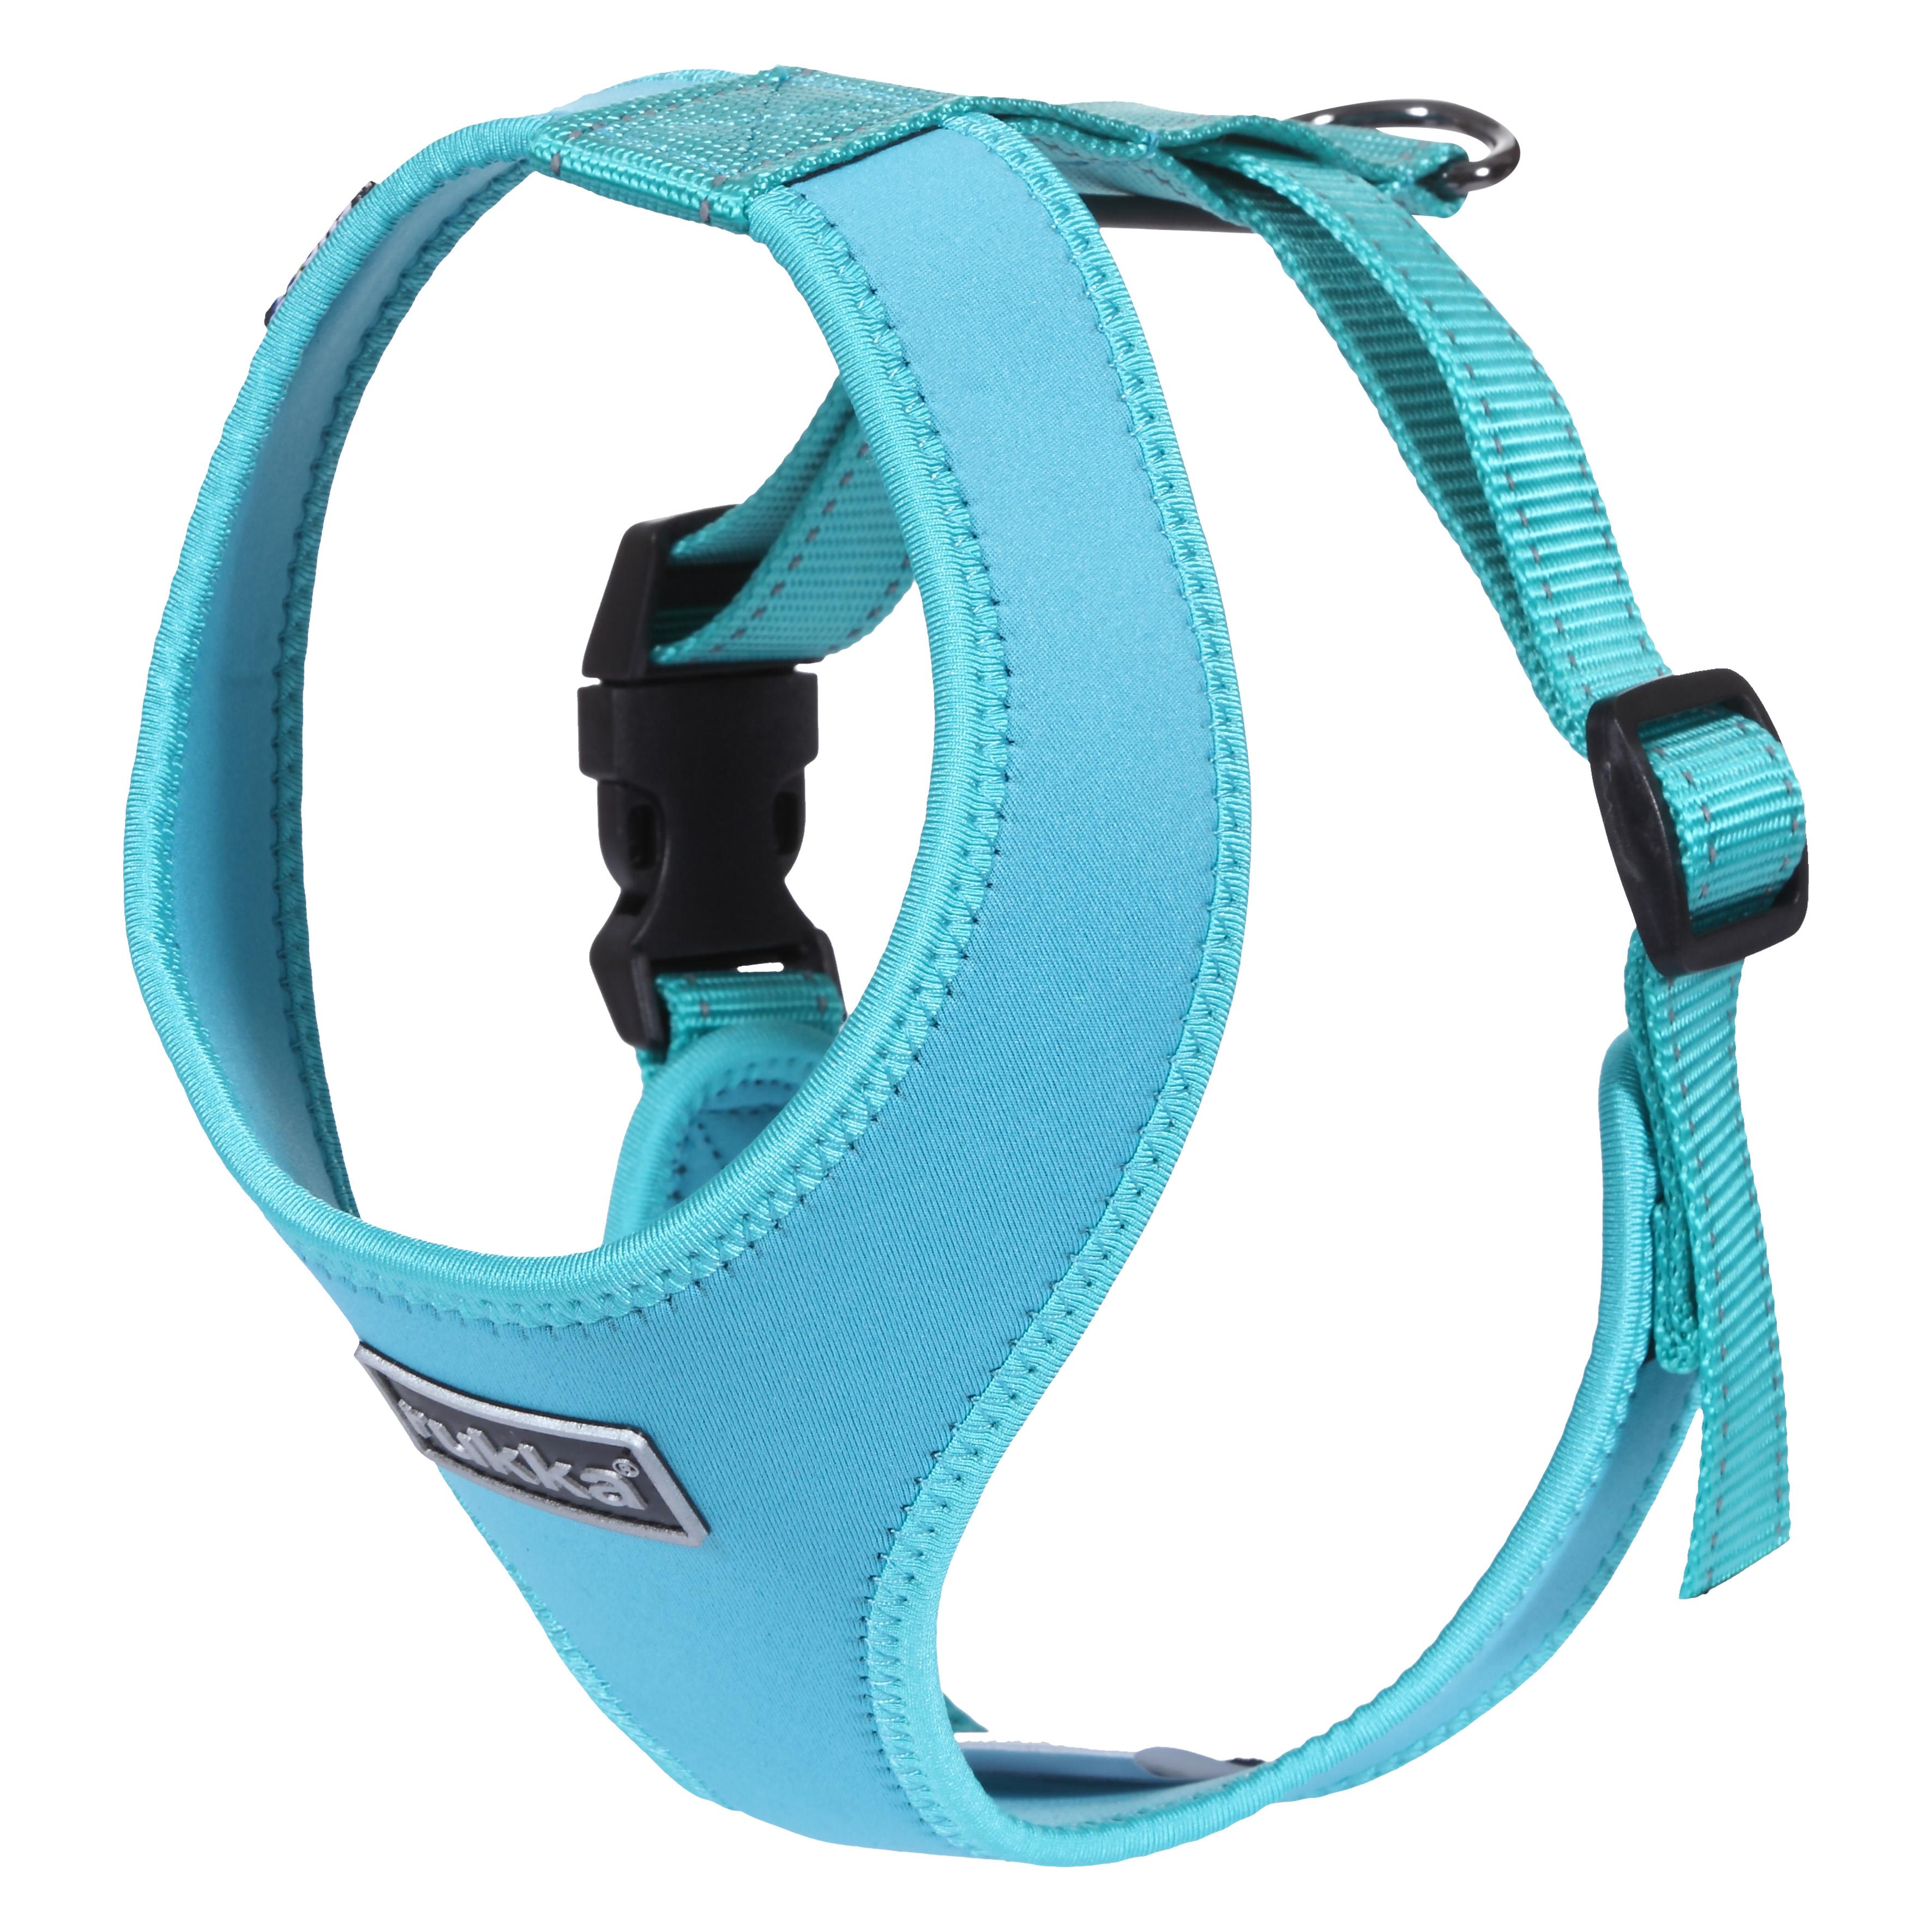 Шлейка для собак RUKKA Mini comfort, голубвя, 22-32см х 20см фото